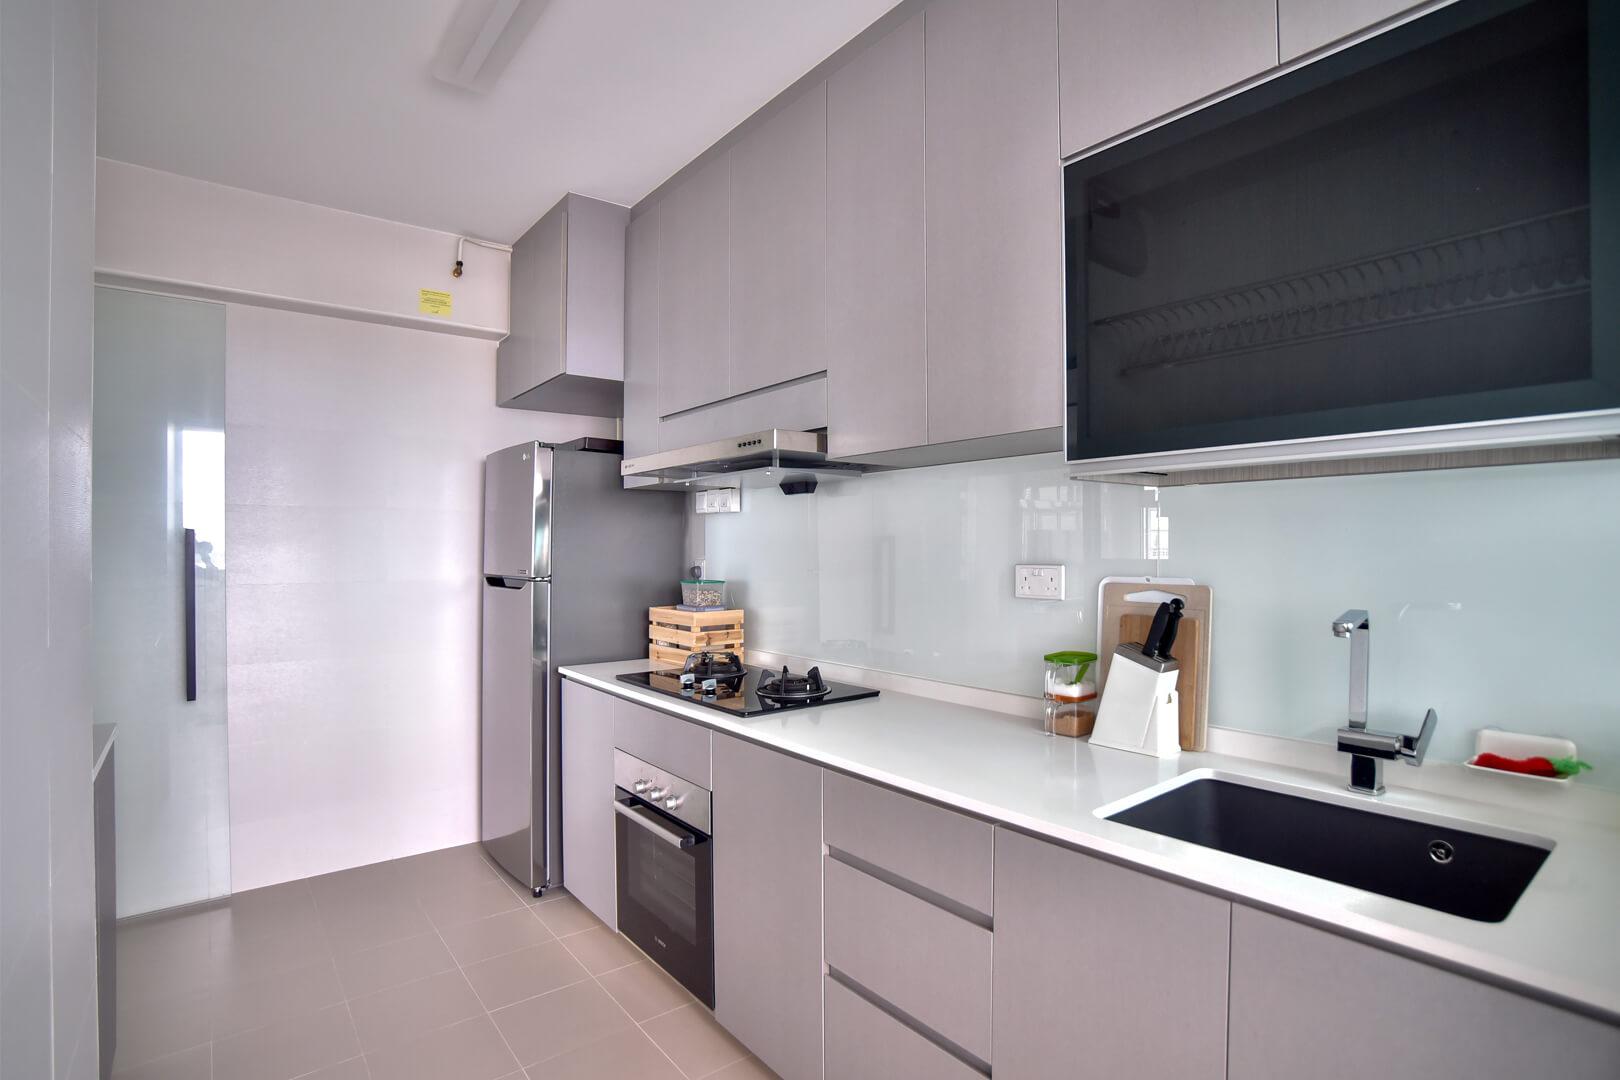 White Monochrome Interior Design kitchen Inside View